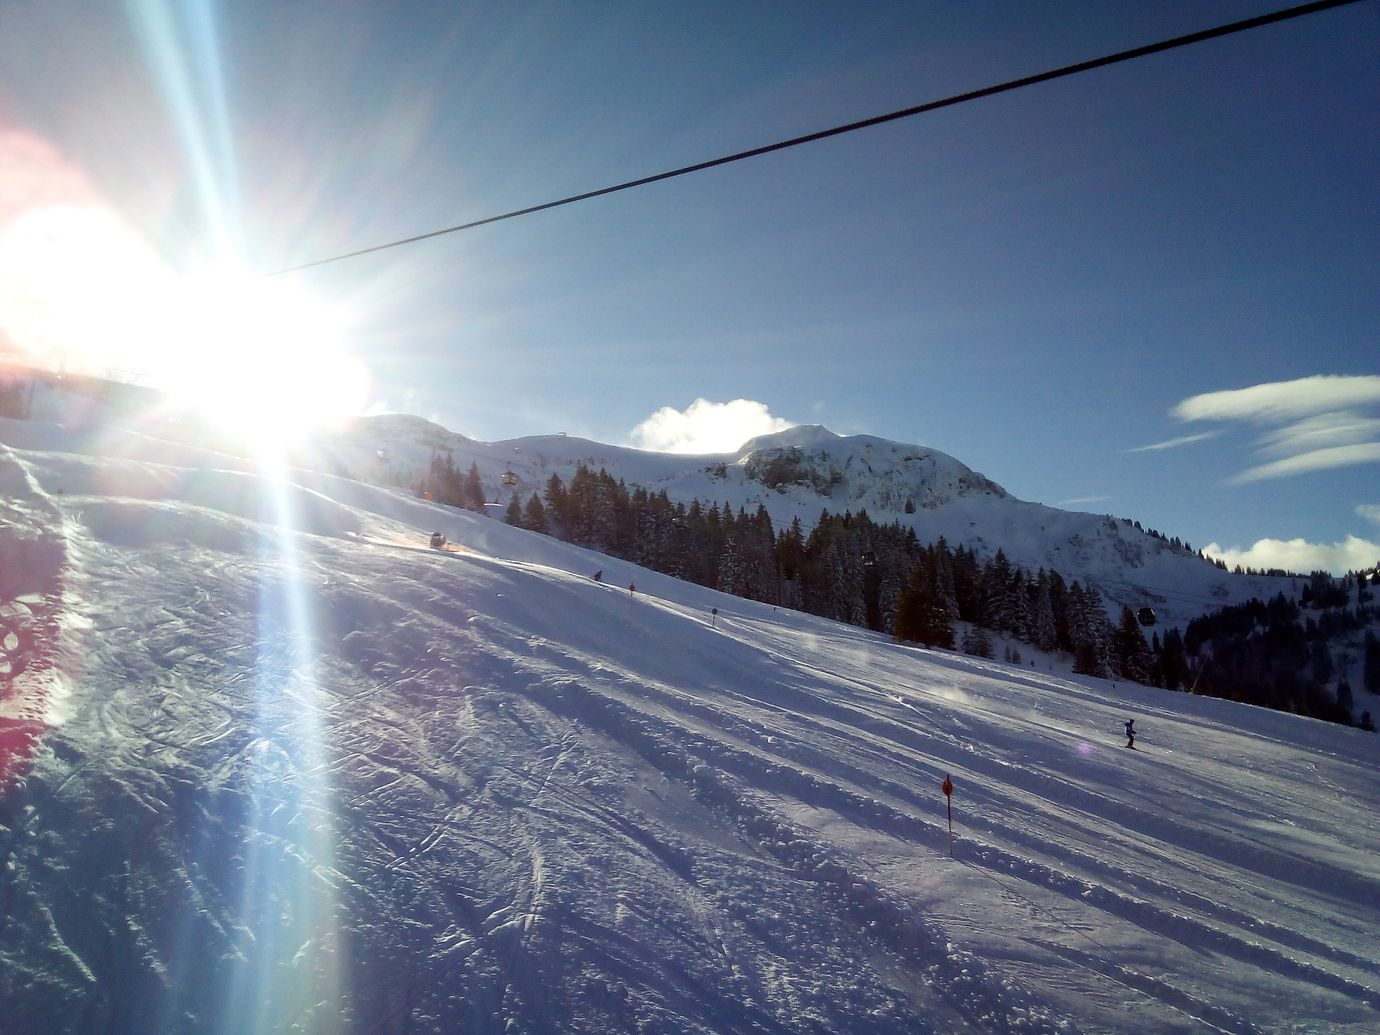 1. Skiausfahrt nach Mellau-Damüls im BOGY-Skiwinter 2017/2018